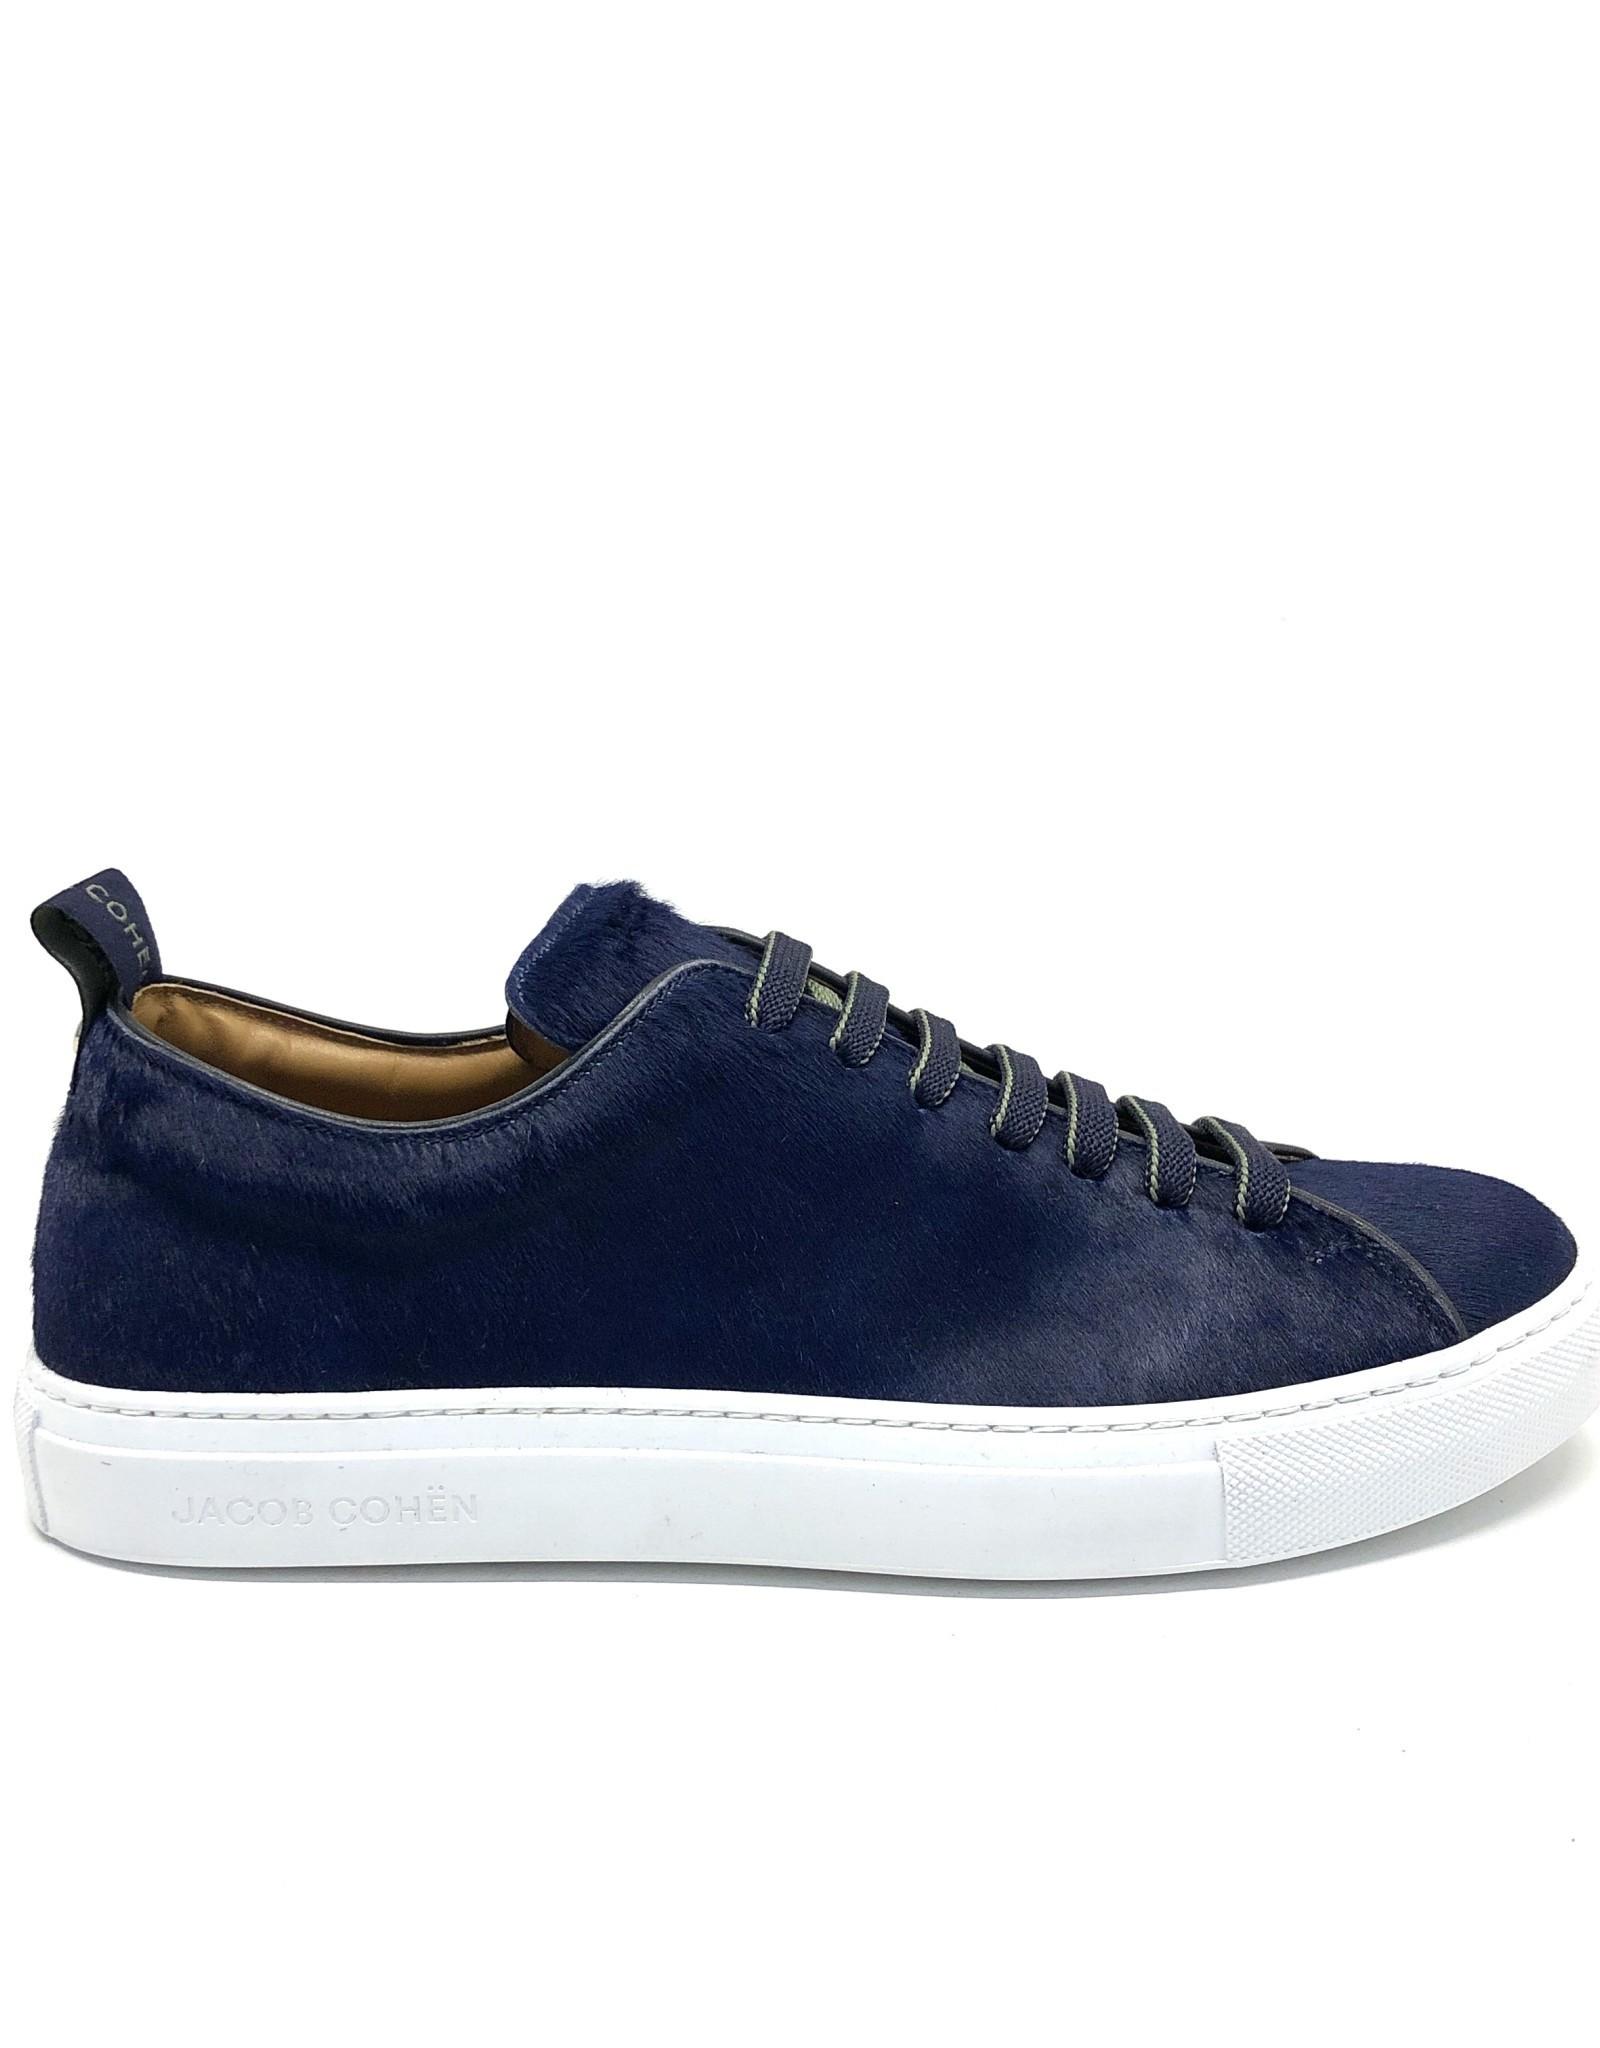 Sneakers BOB JCC866 Blue